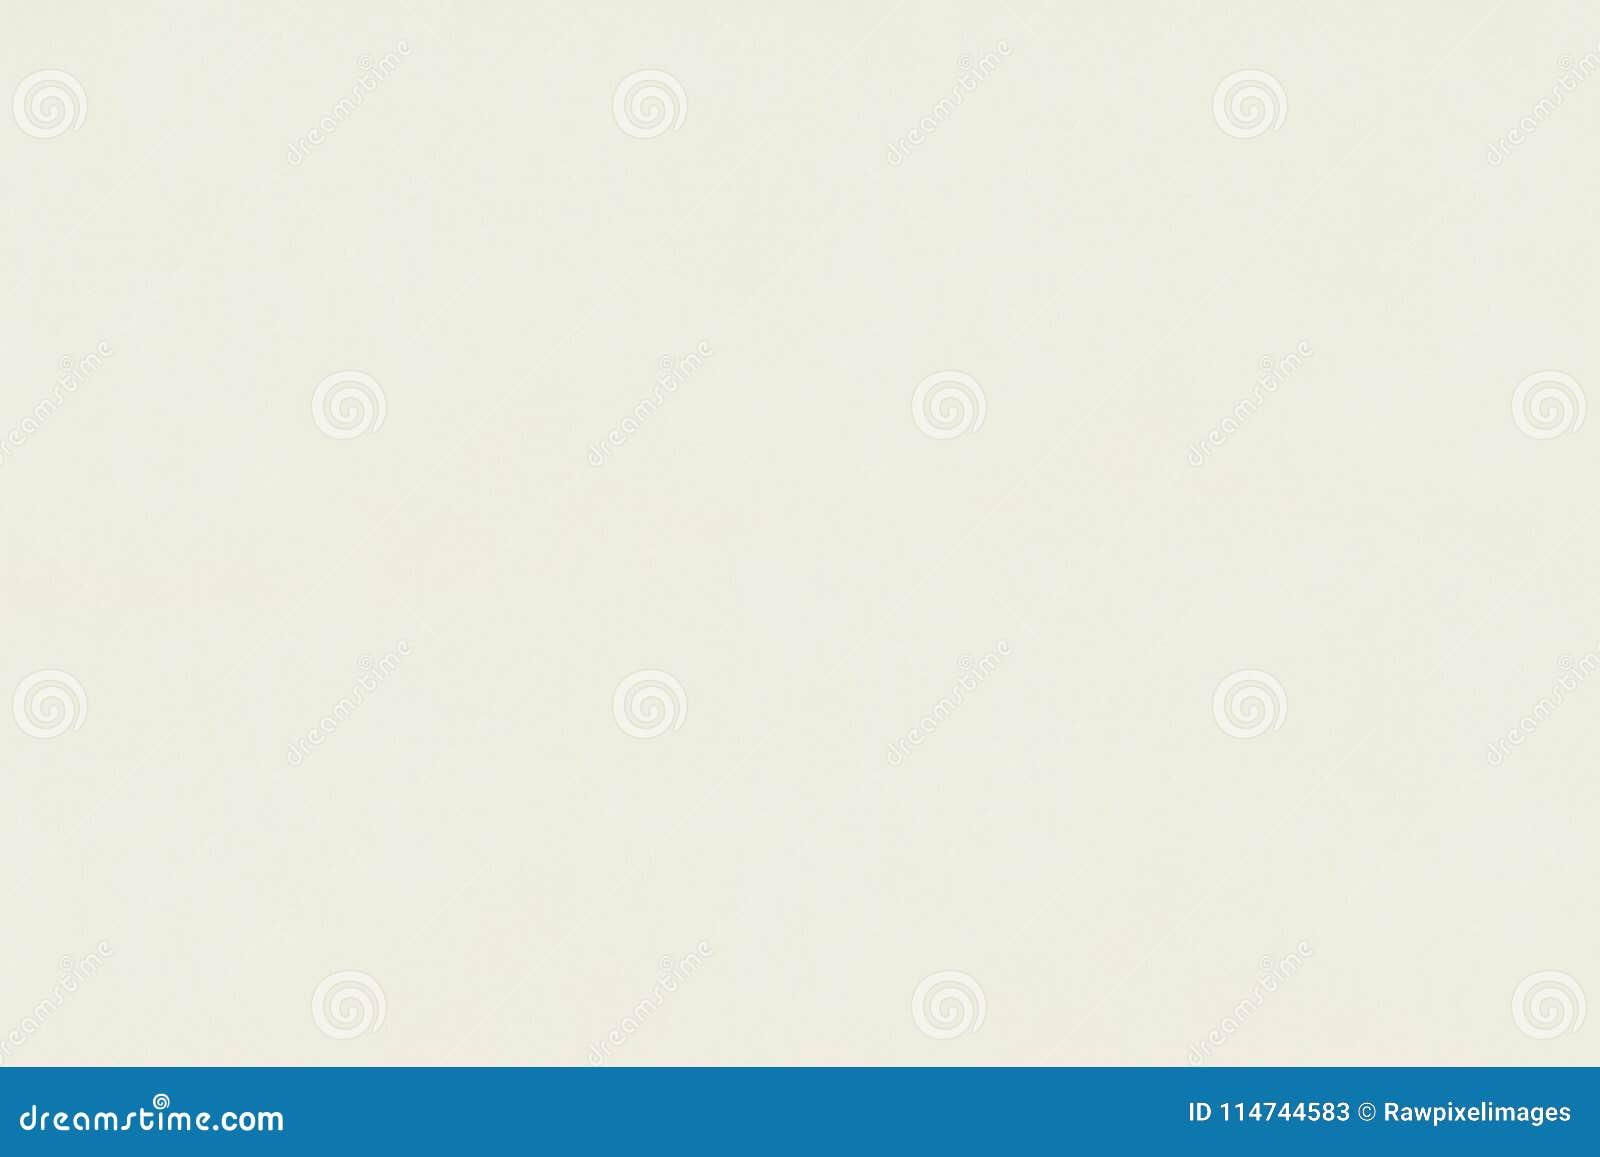 Vintage Plain White Wallpaper Background Stock Image Image